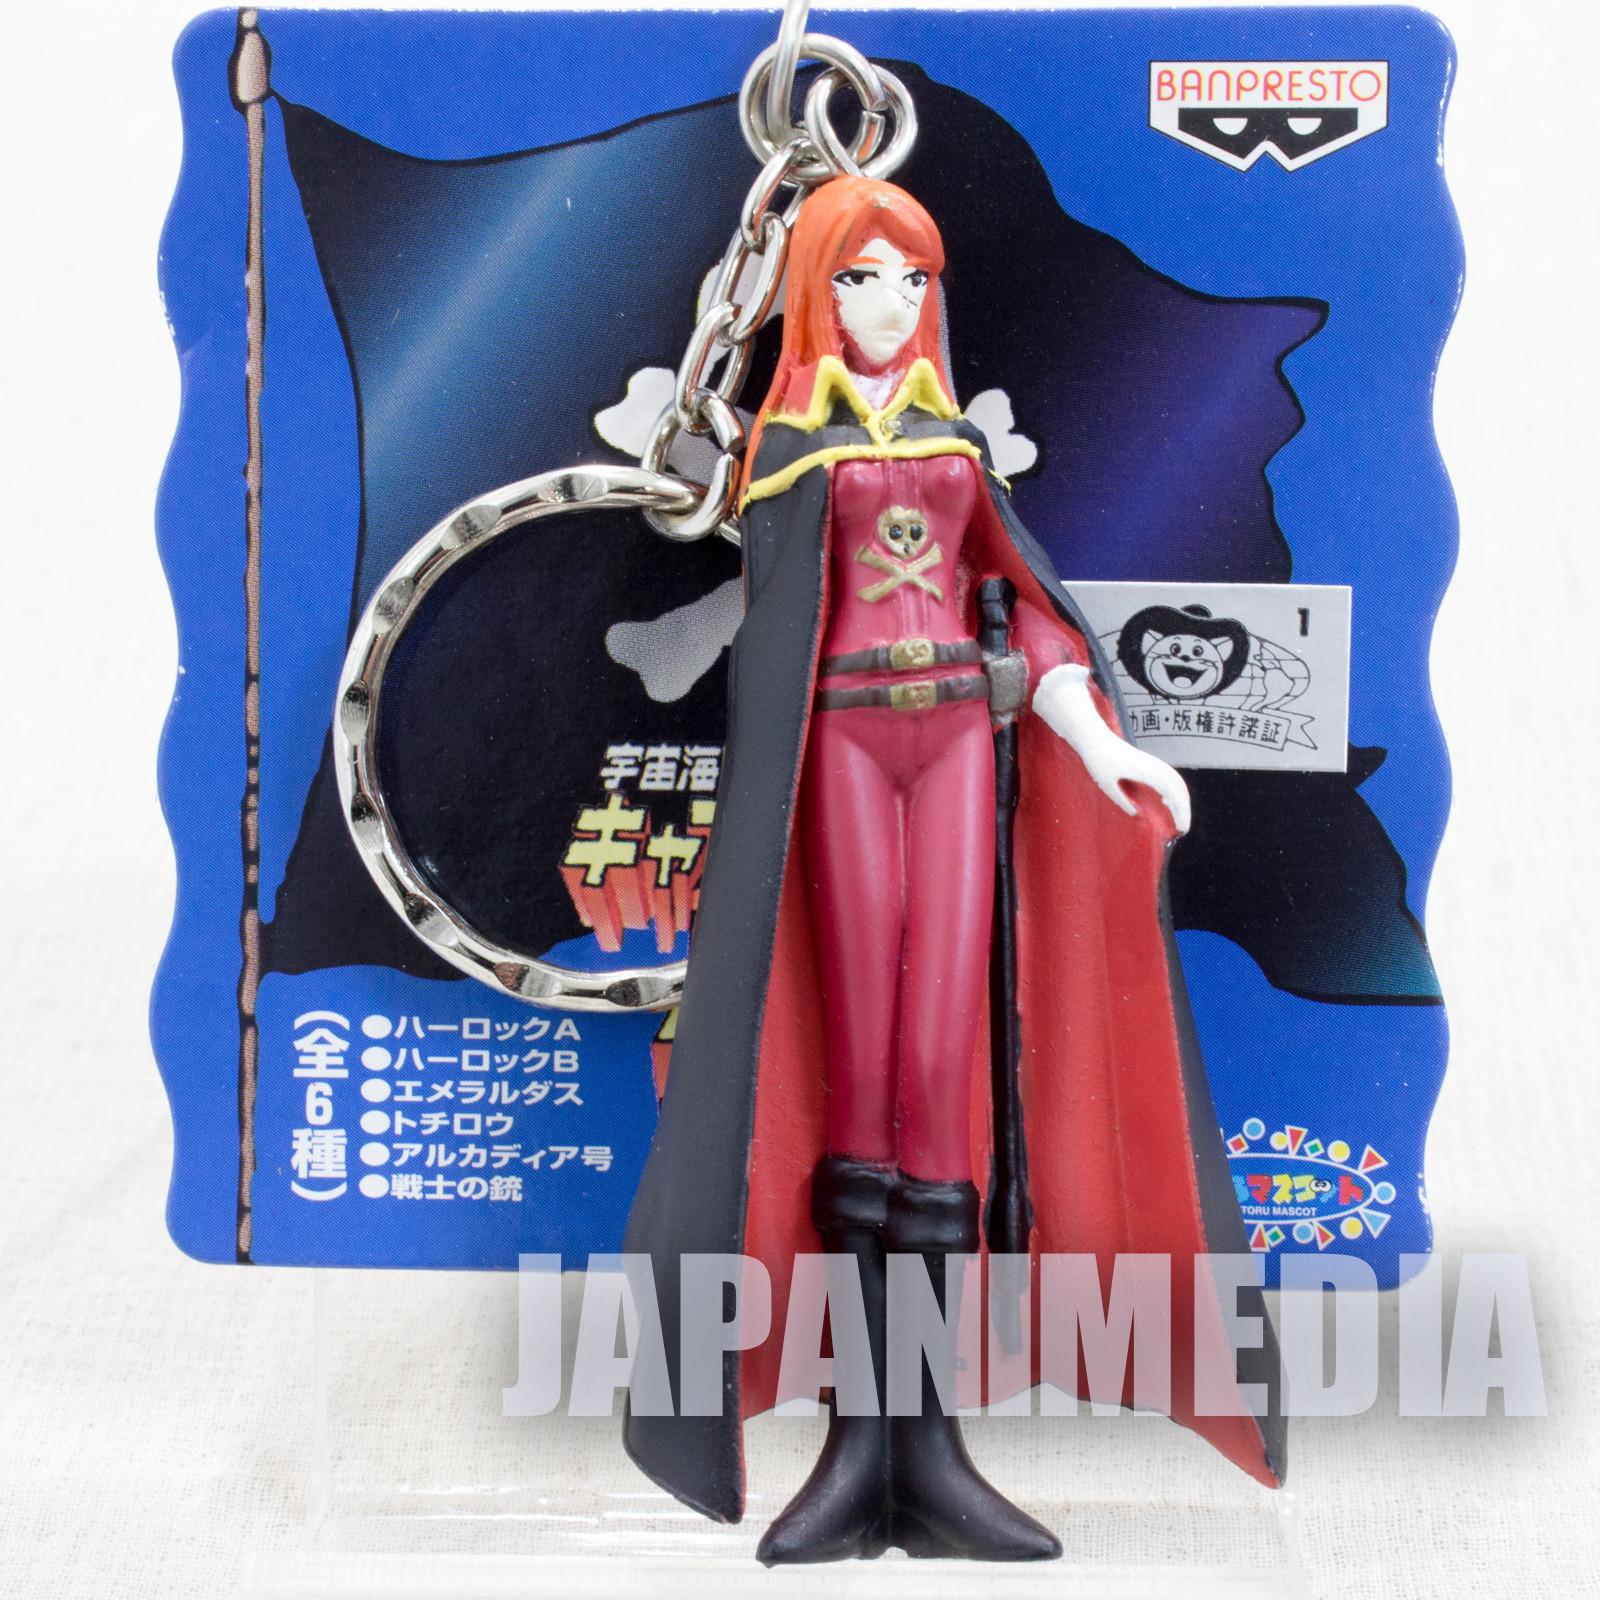 Space Pirate Captain Harlock Queen Emeraldas Figure Key Chain JAPAN ANIME MANGA